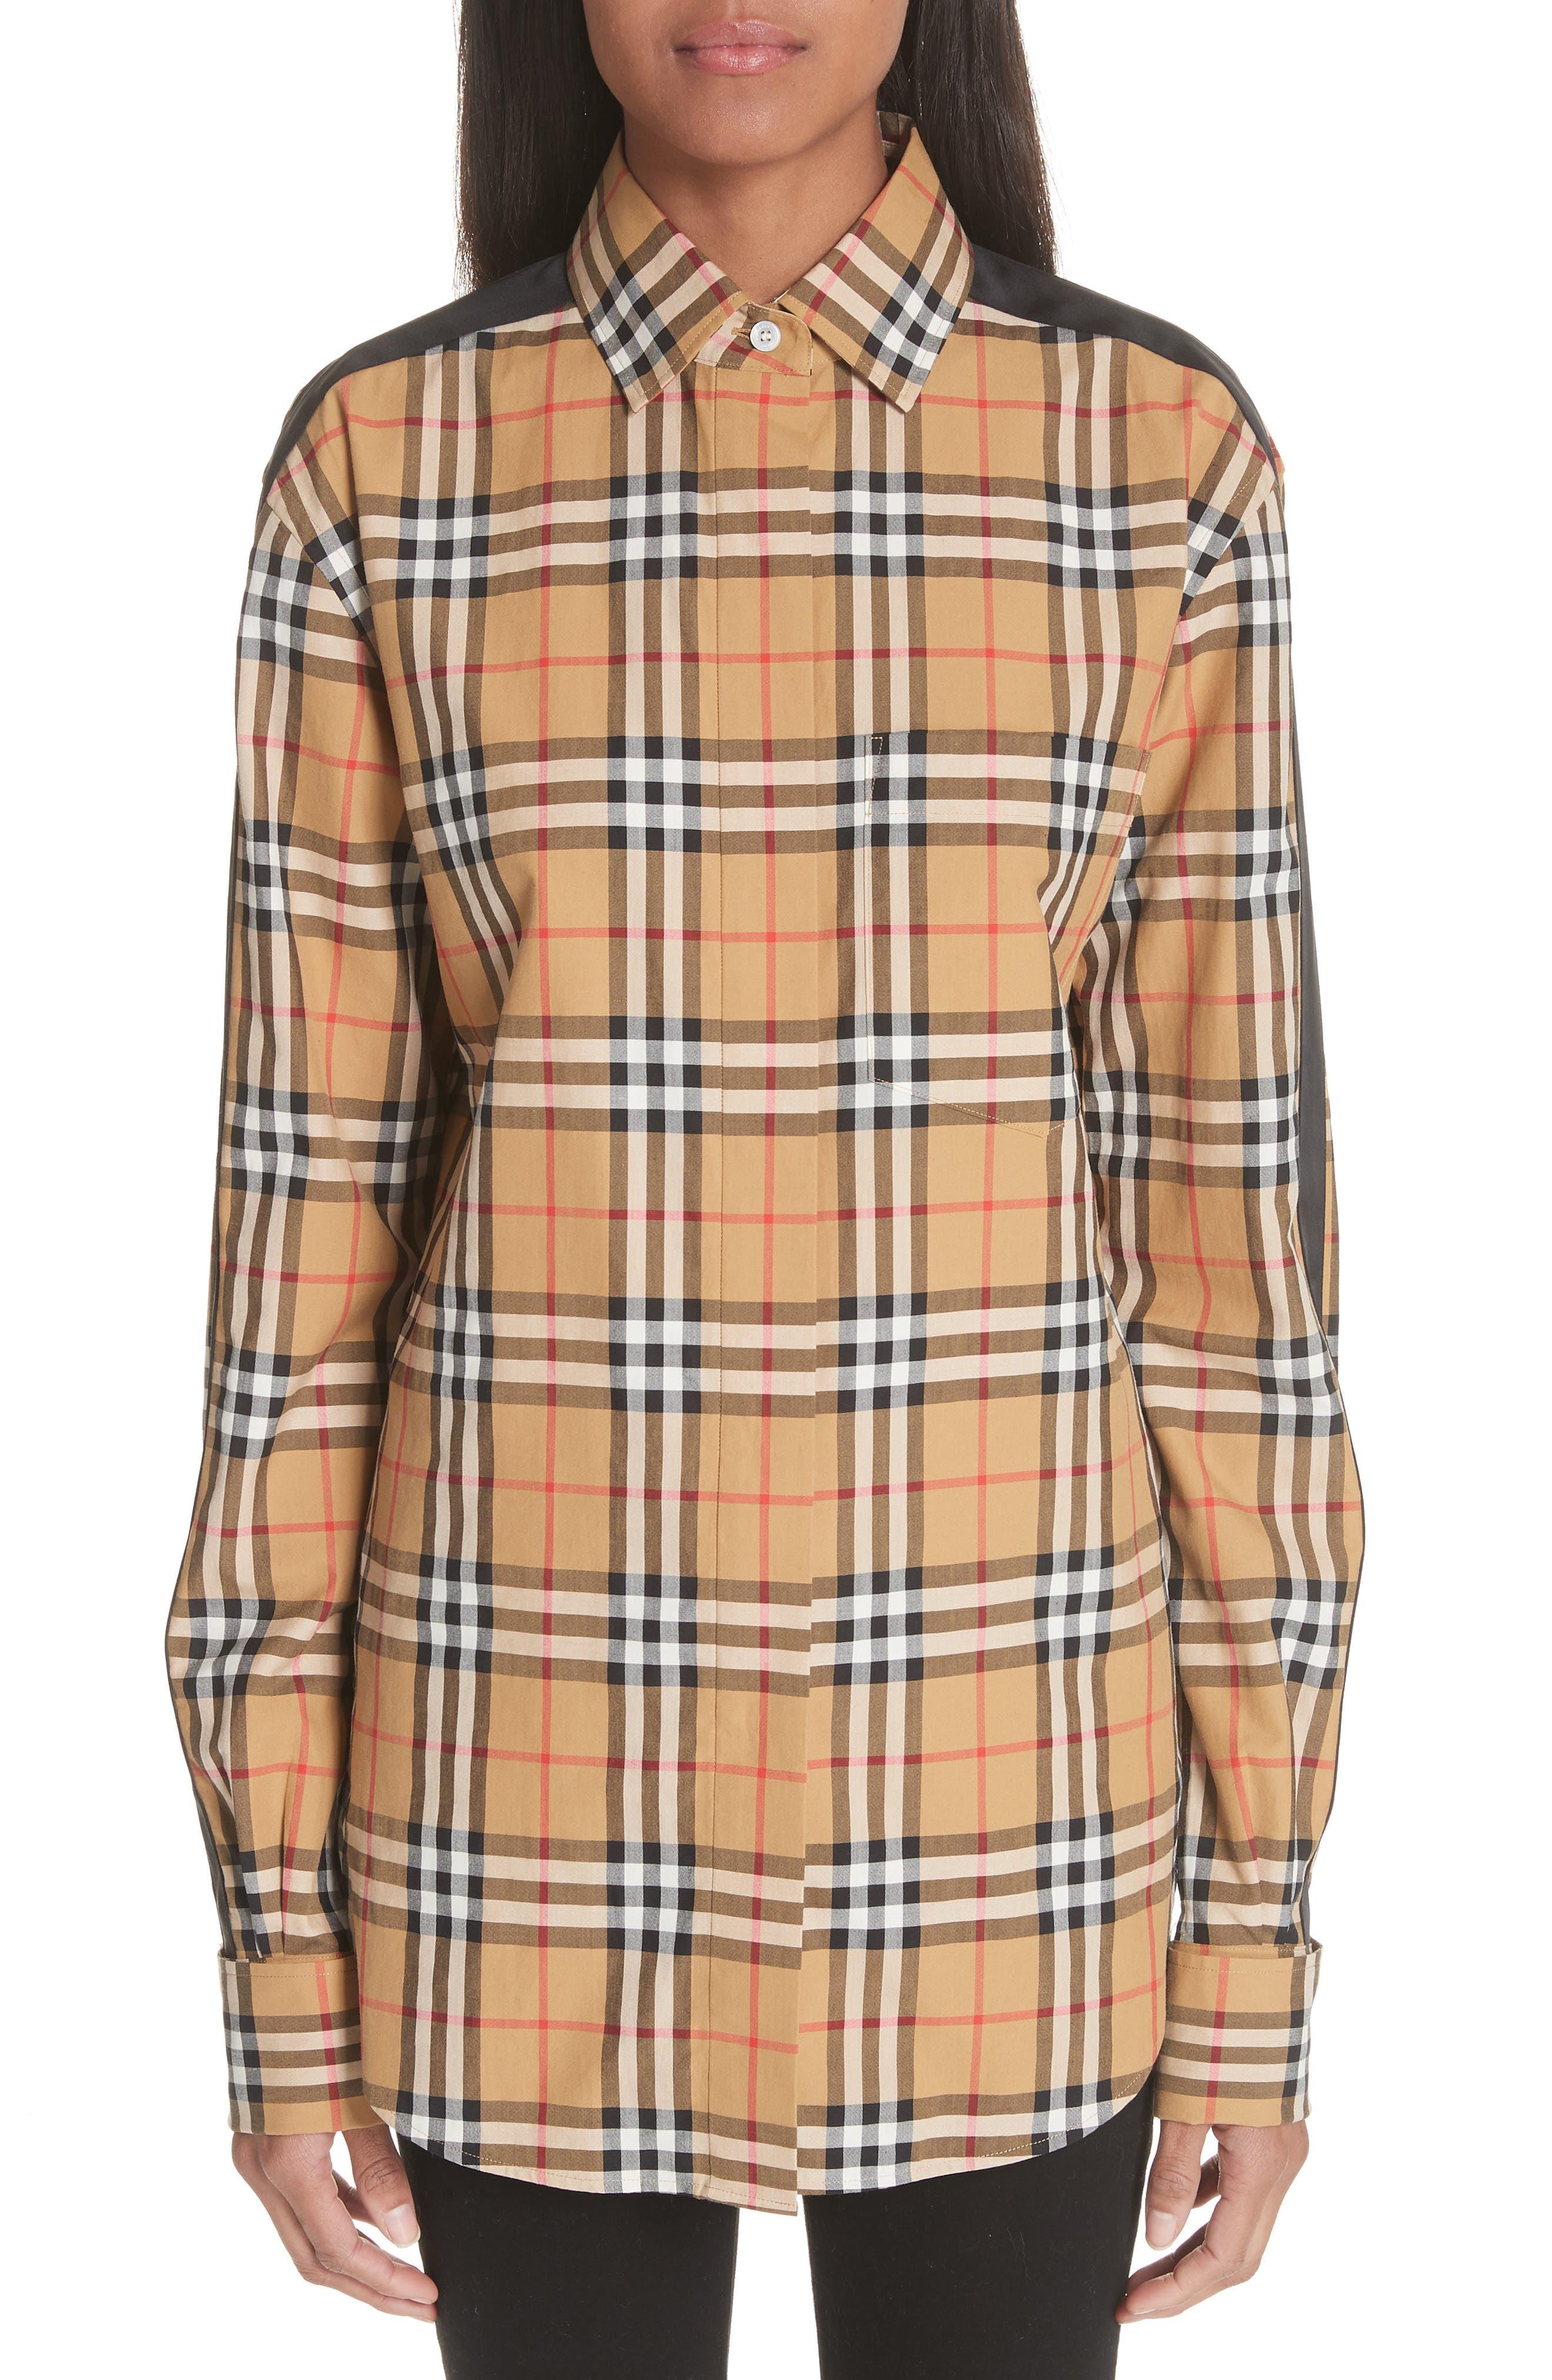 Burberry Saoirse Vintage Check Cotton Top